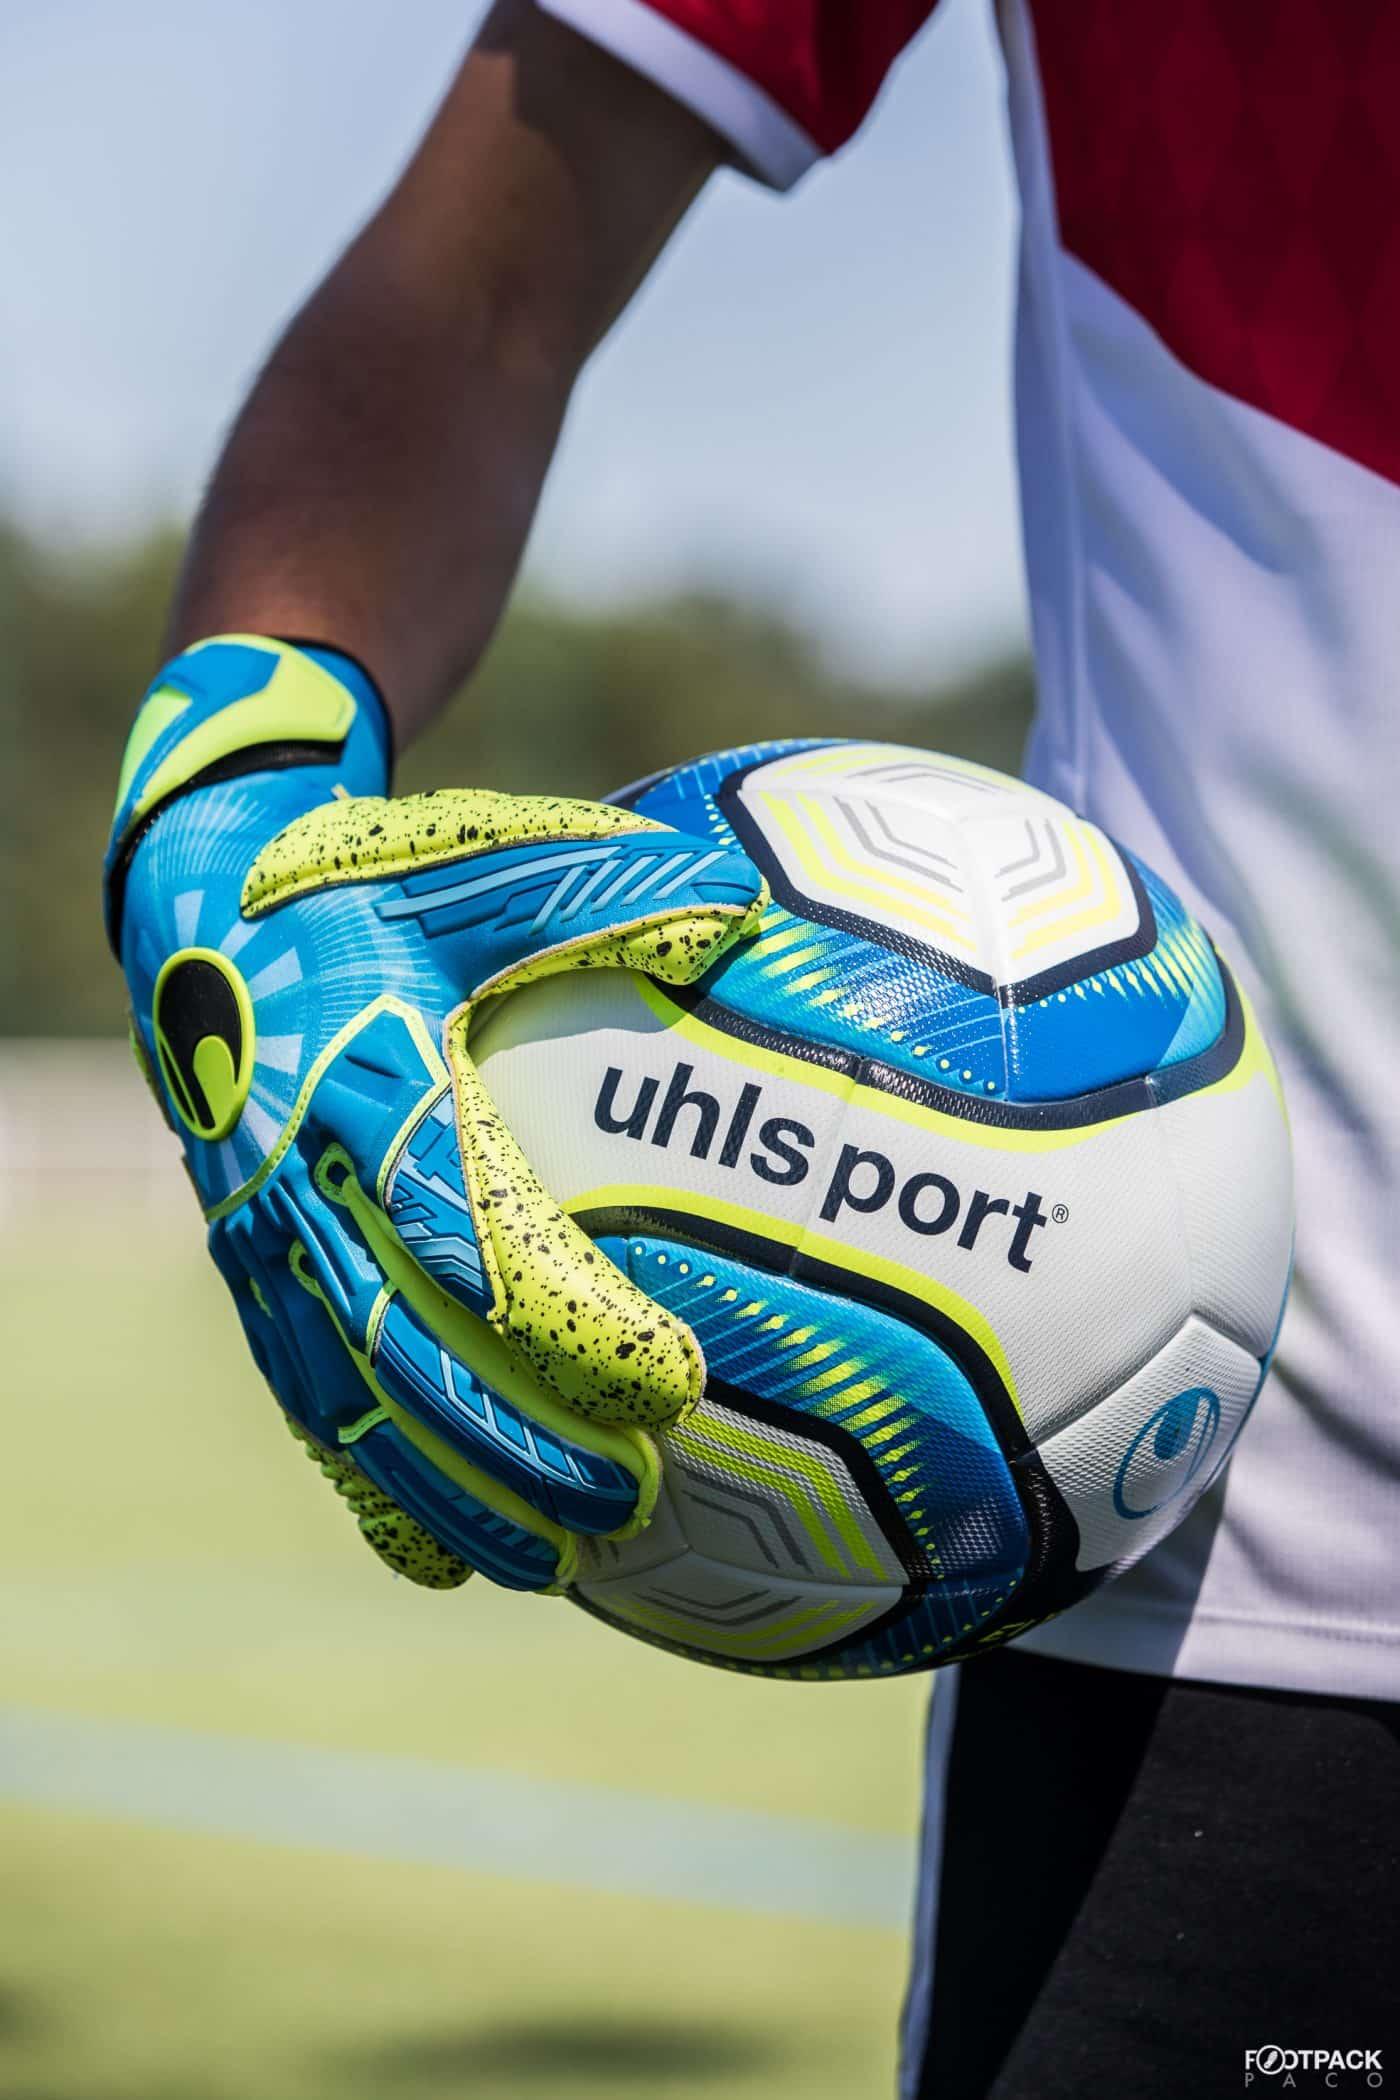 ballon-ulhsport-elysia-ligue-1-2019-2020-footpack-1